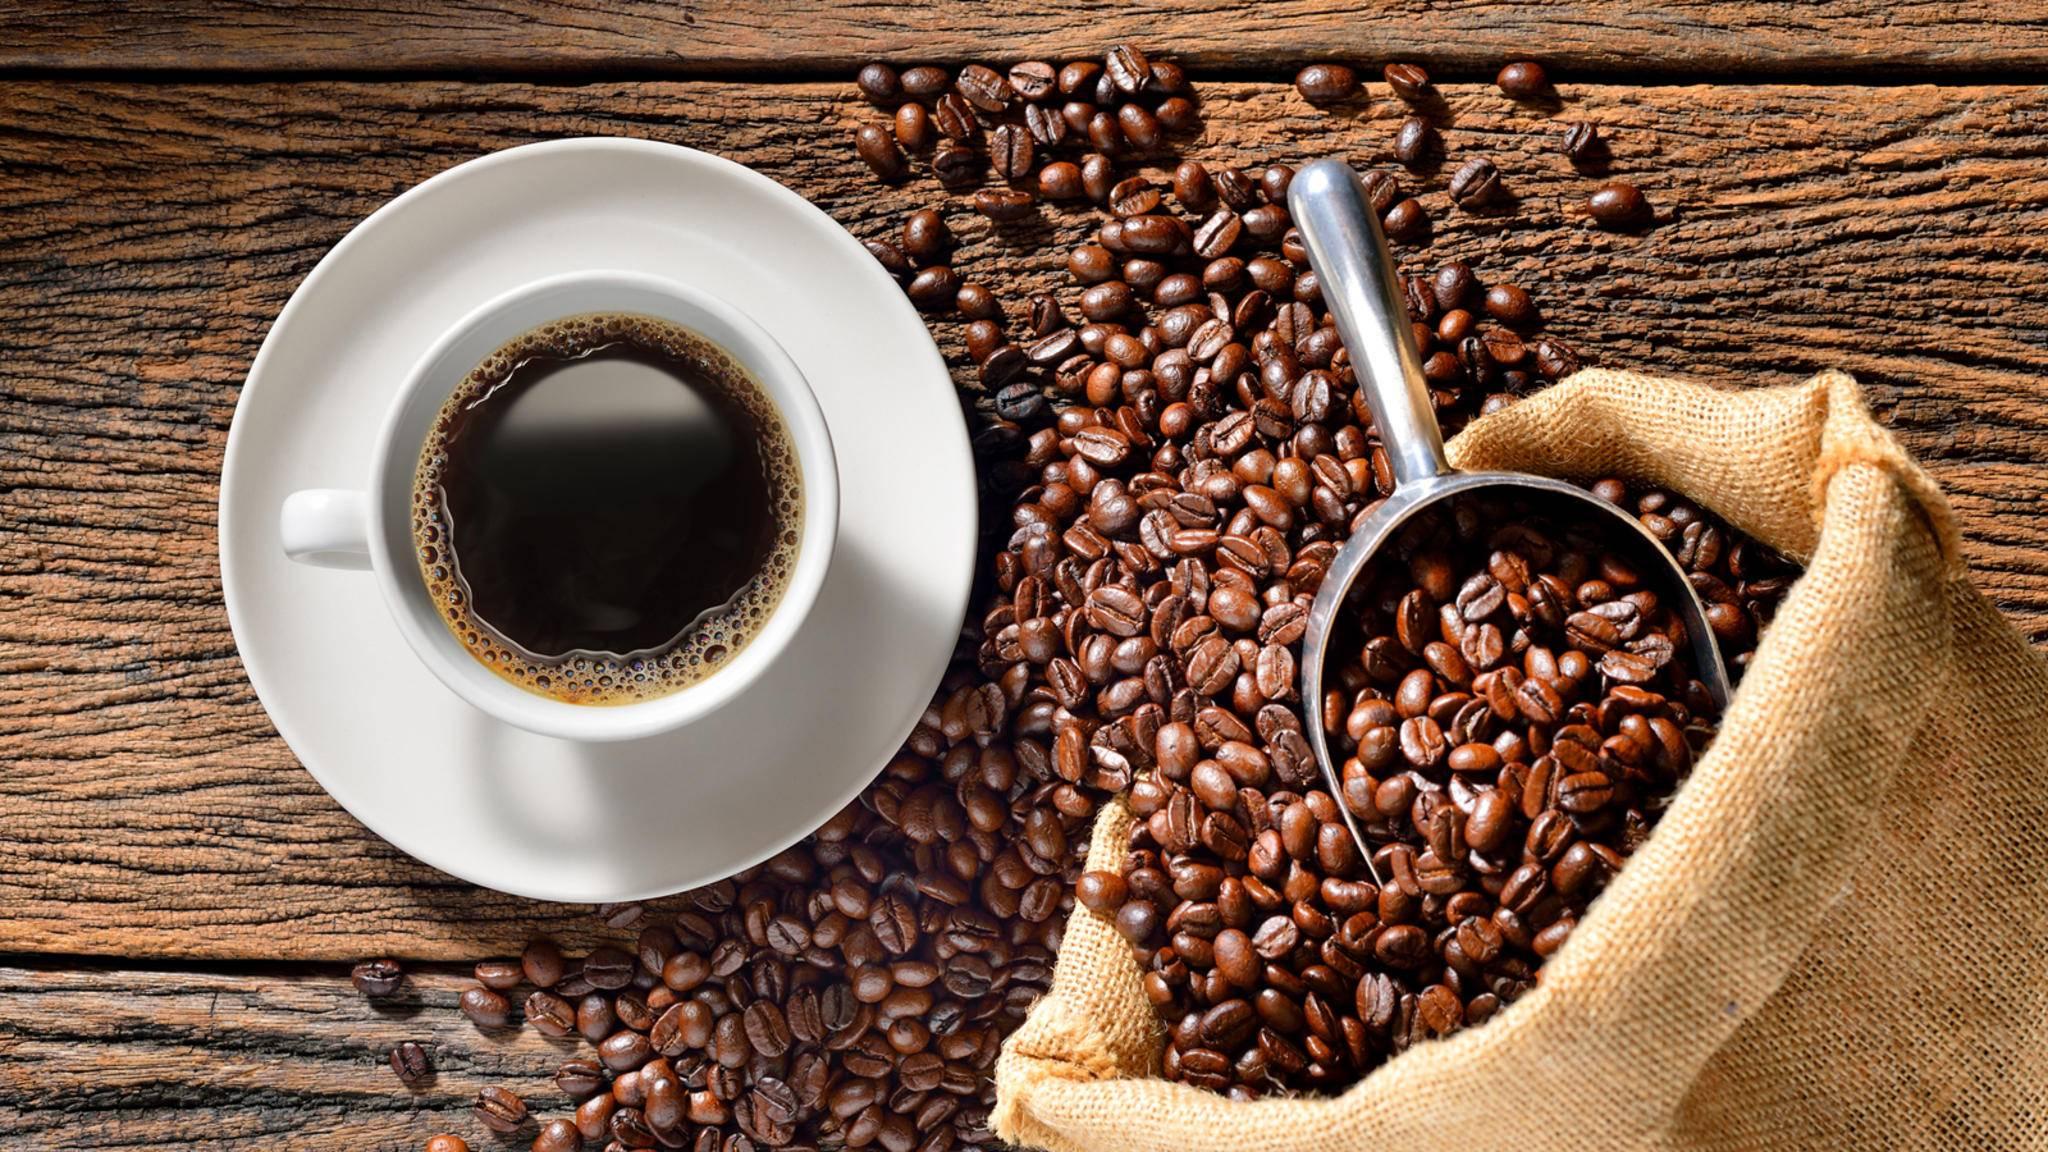 Wir verraten Dir, wie Du Deinen Kaffee am besten aufbewahrst.